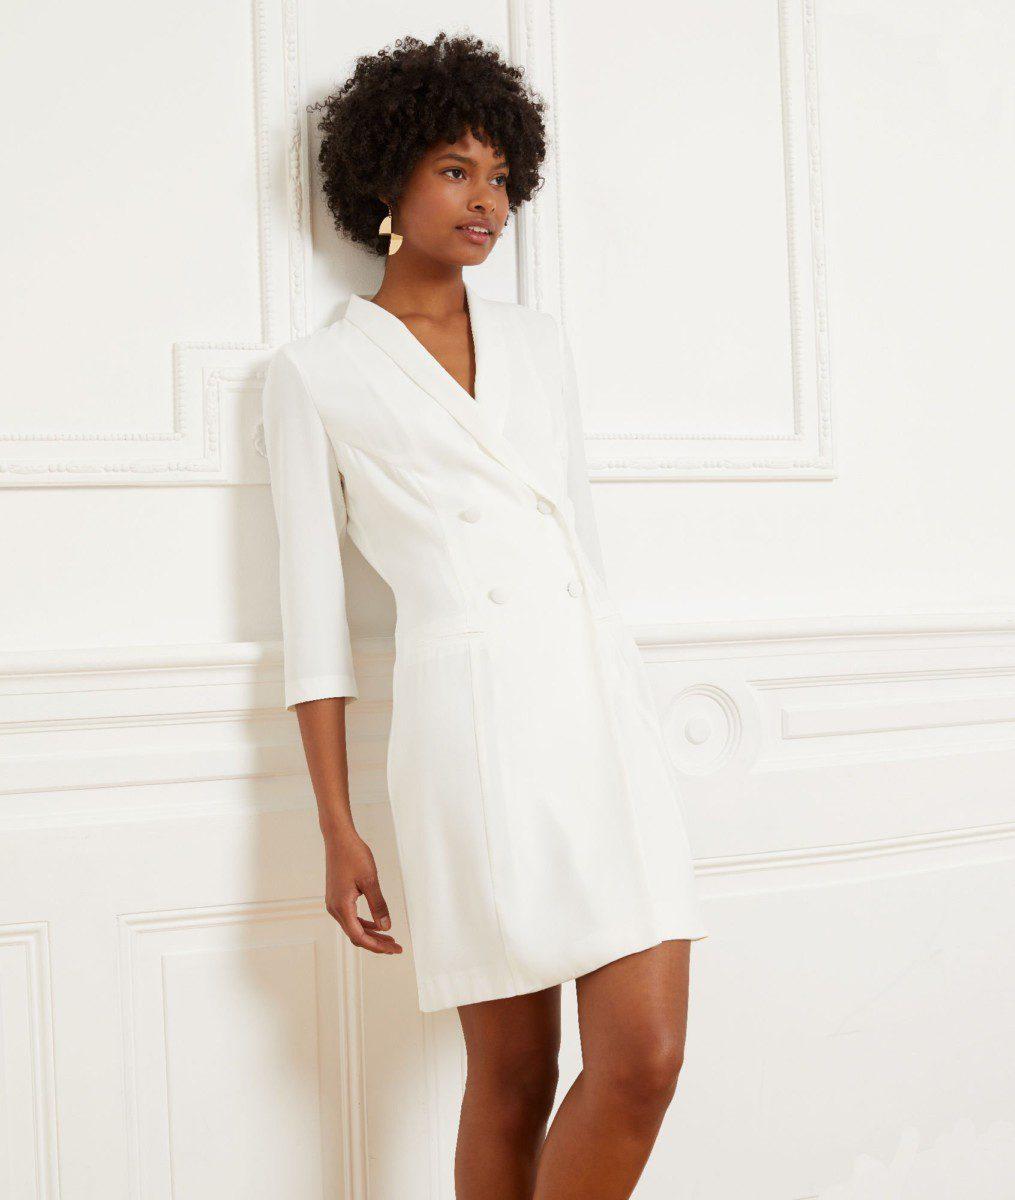 chercher acheter maintenant gros en ligne Etam - Robe smoking en crêpe envers satin - MILANE